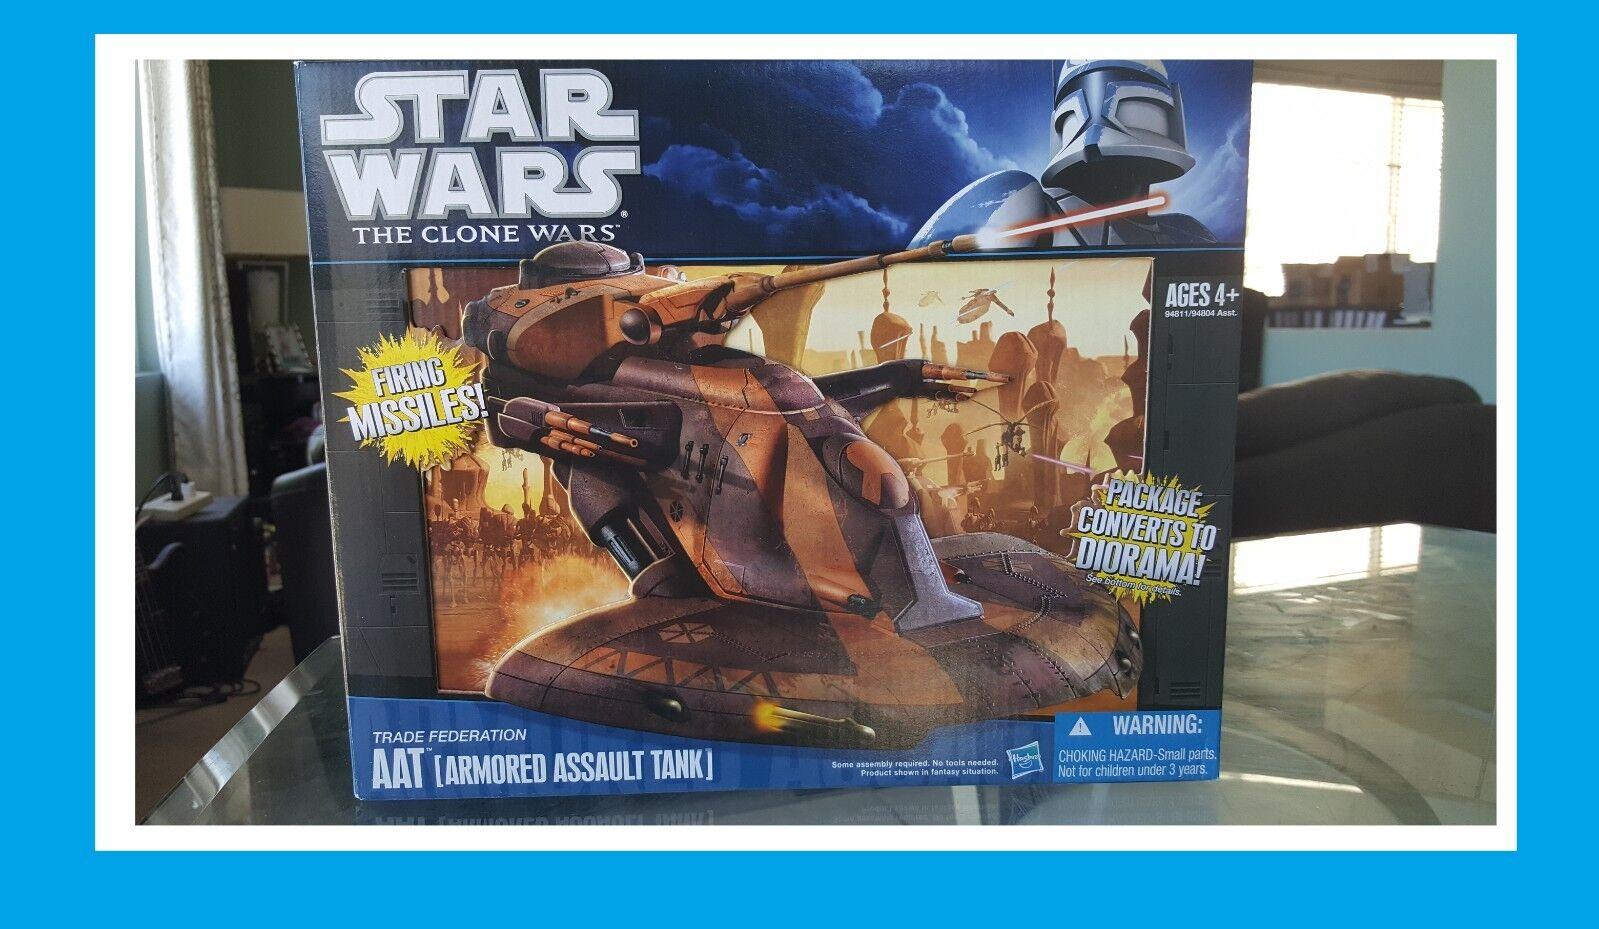 New Star Wars The Clone Wars Trade Federatio AAT ArmoROT Assault Tank DioramaBox